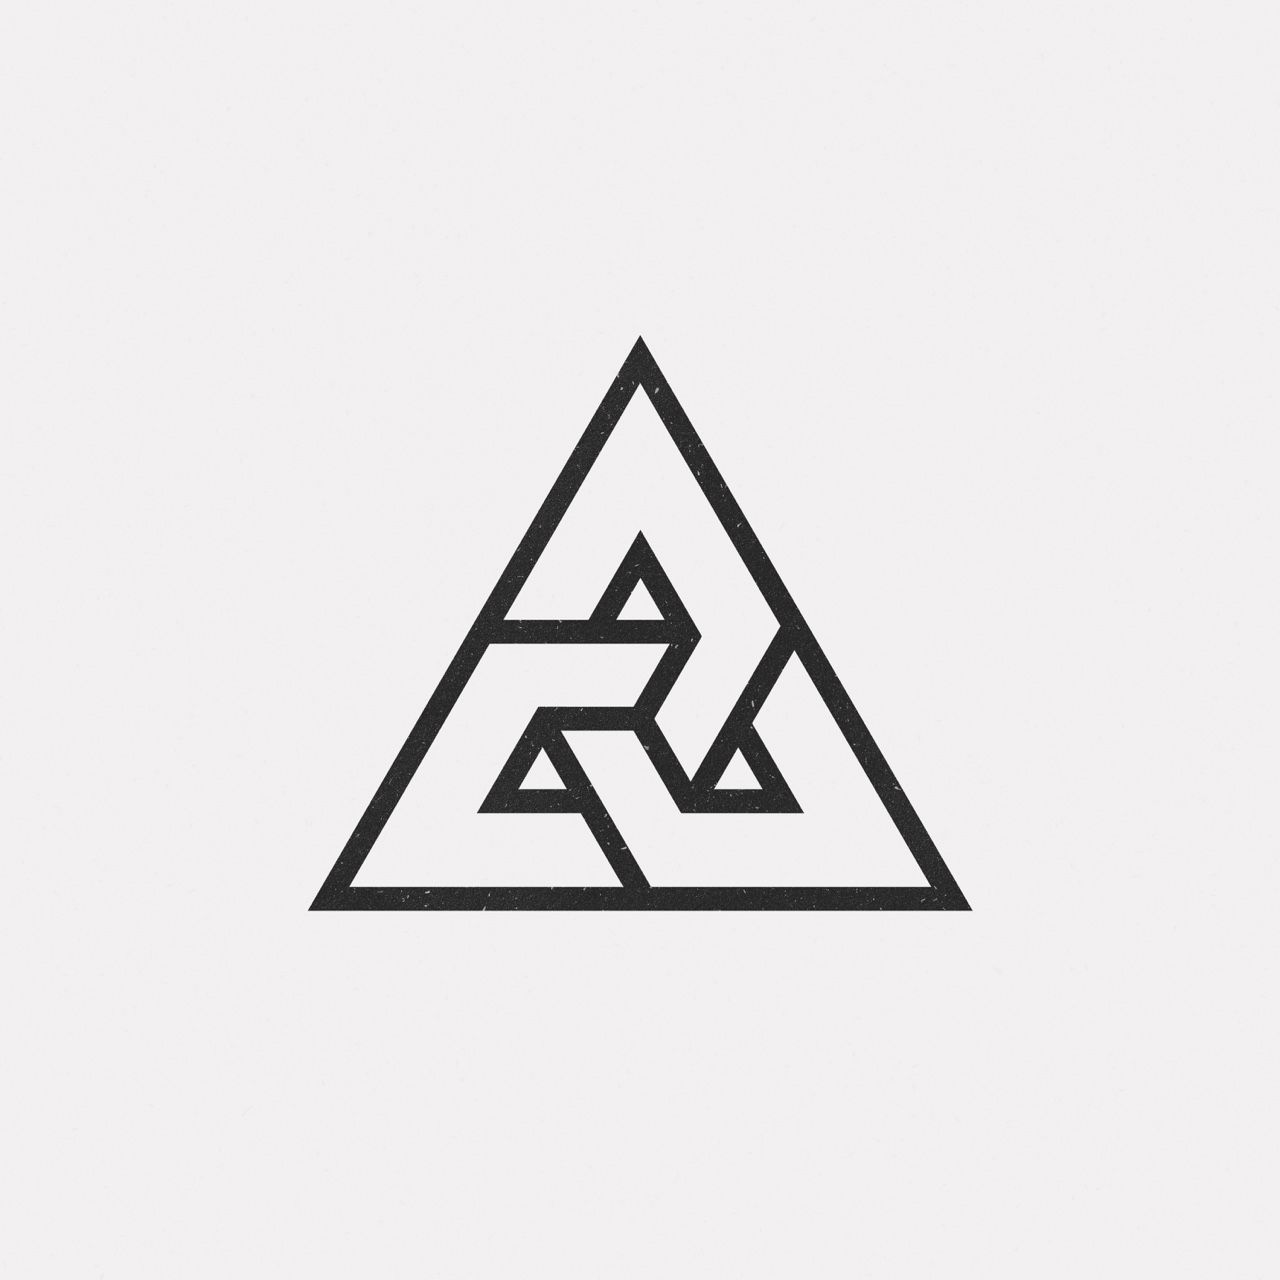 Ju16 616 a new geometric design every day pinteres for Minimal art logo